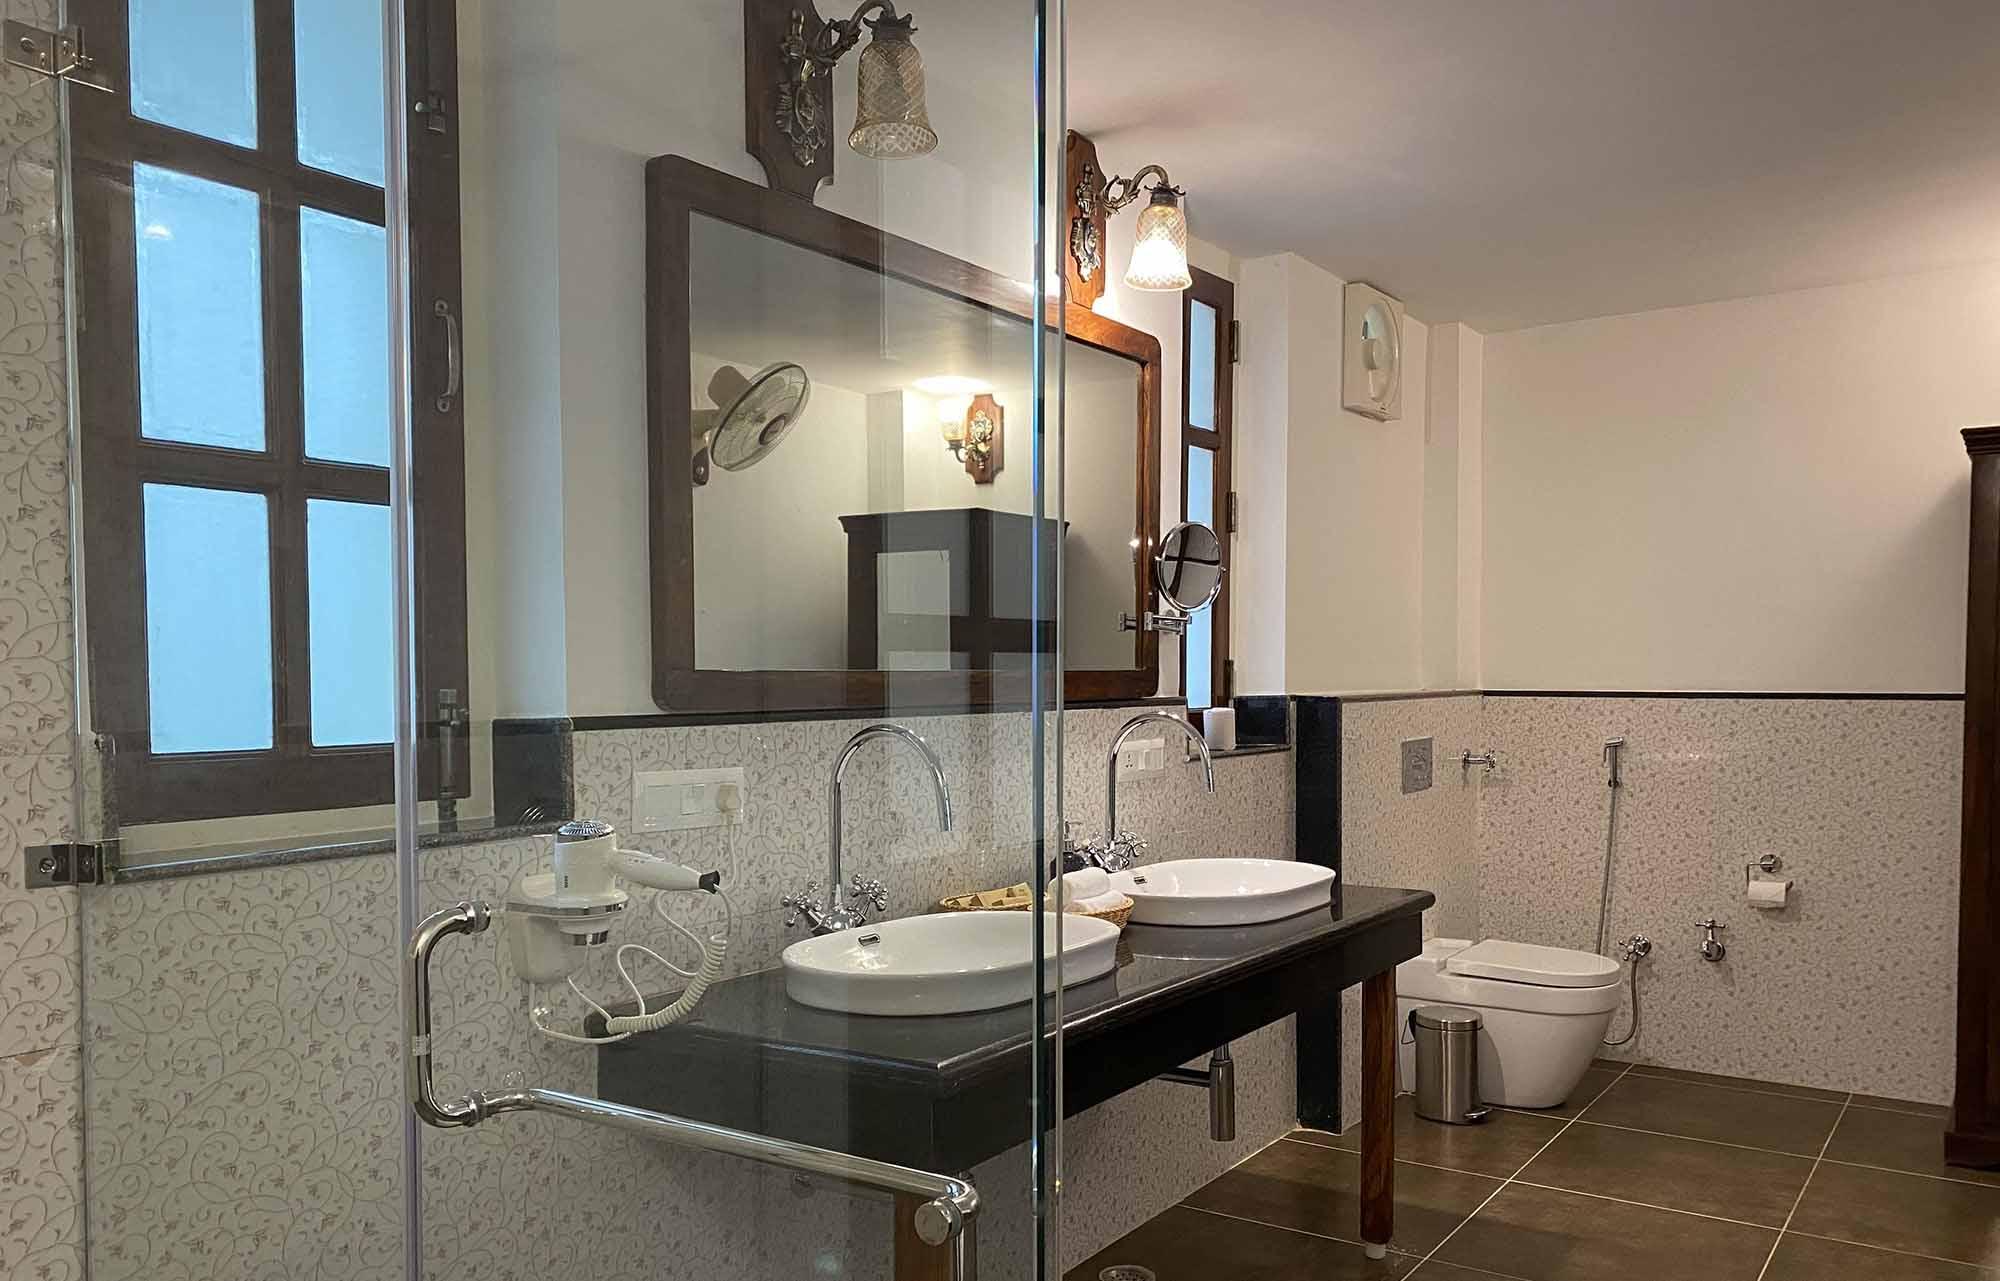 sariska safari washroom